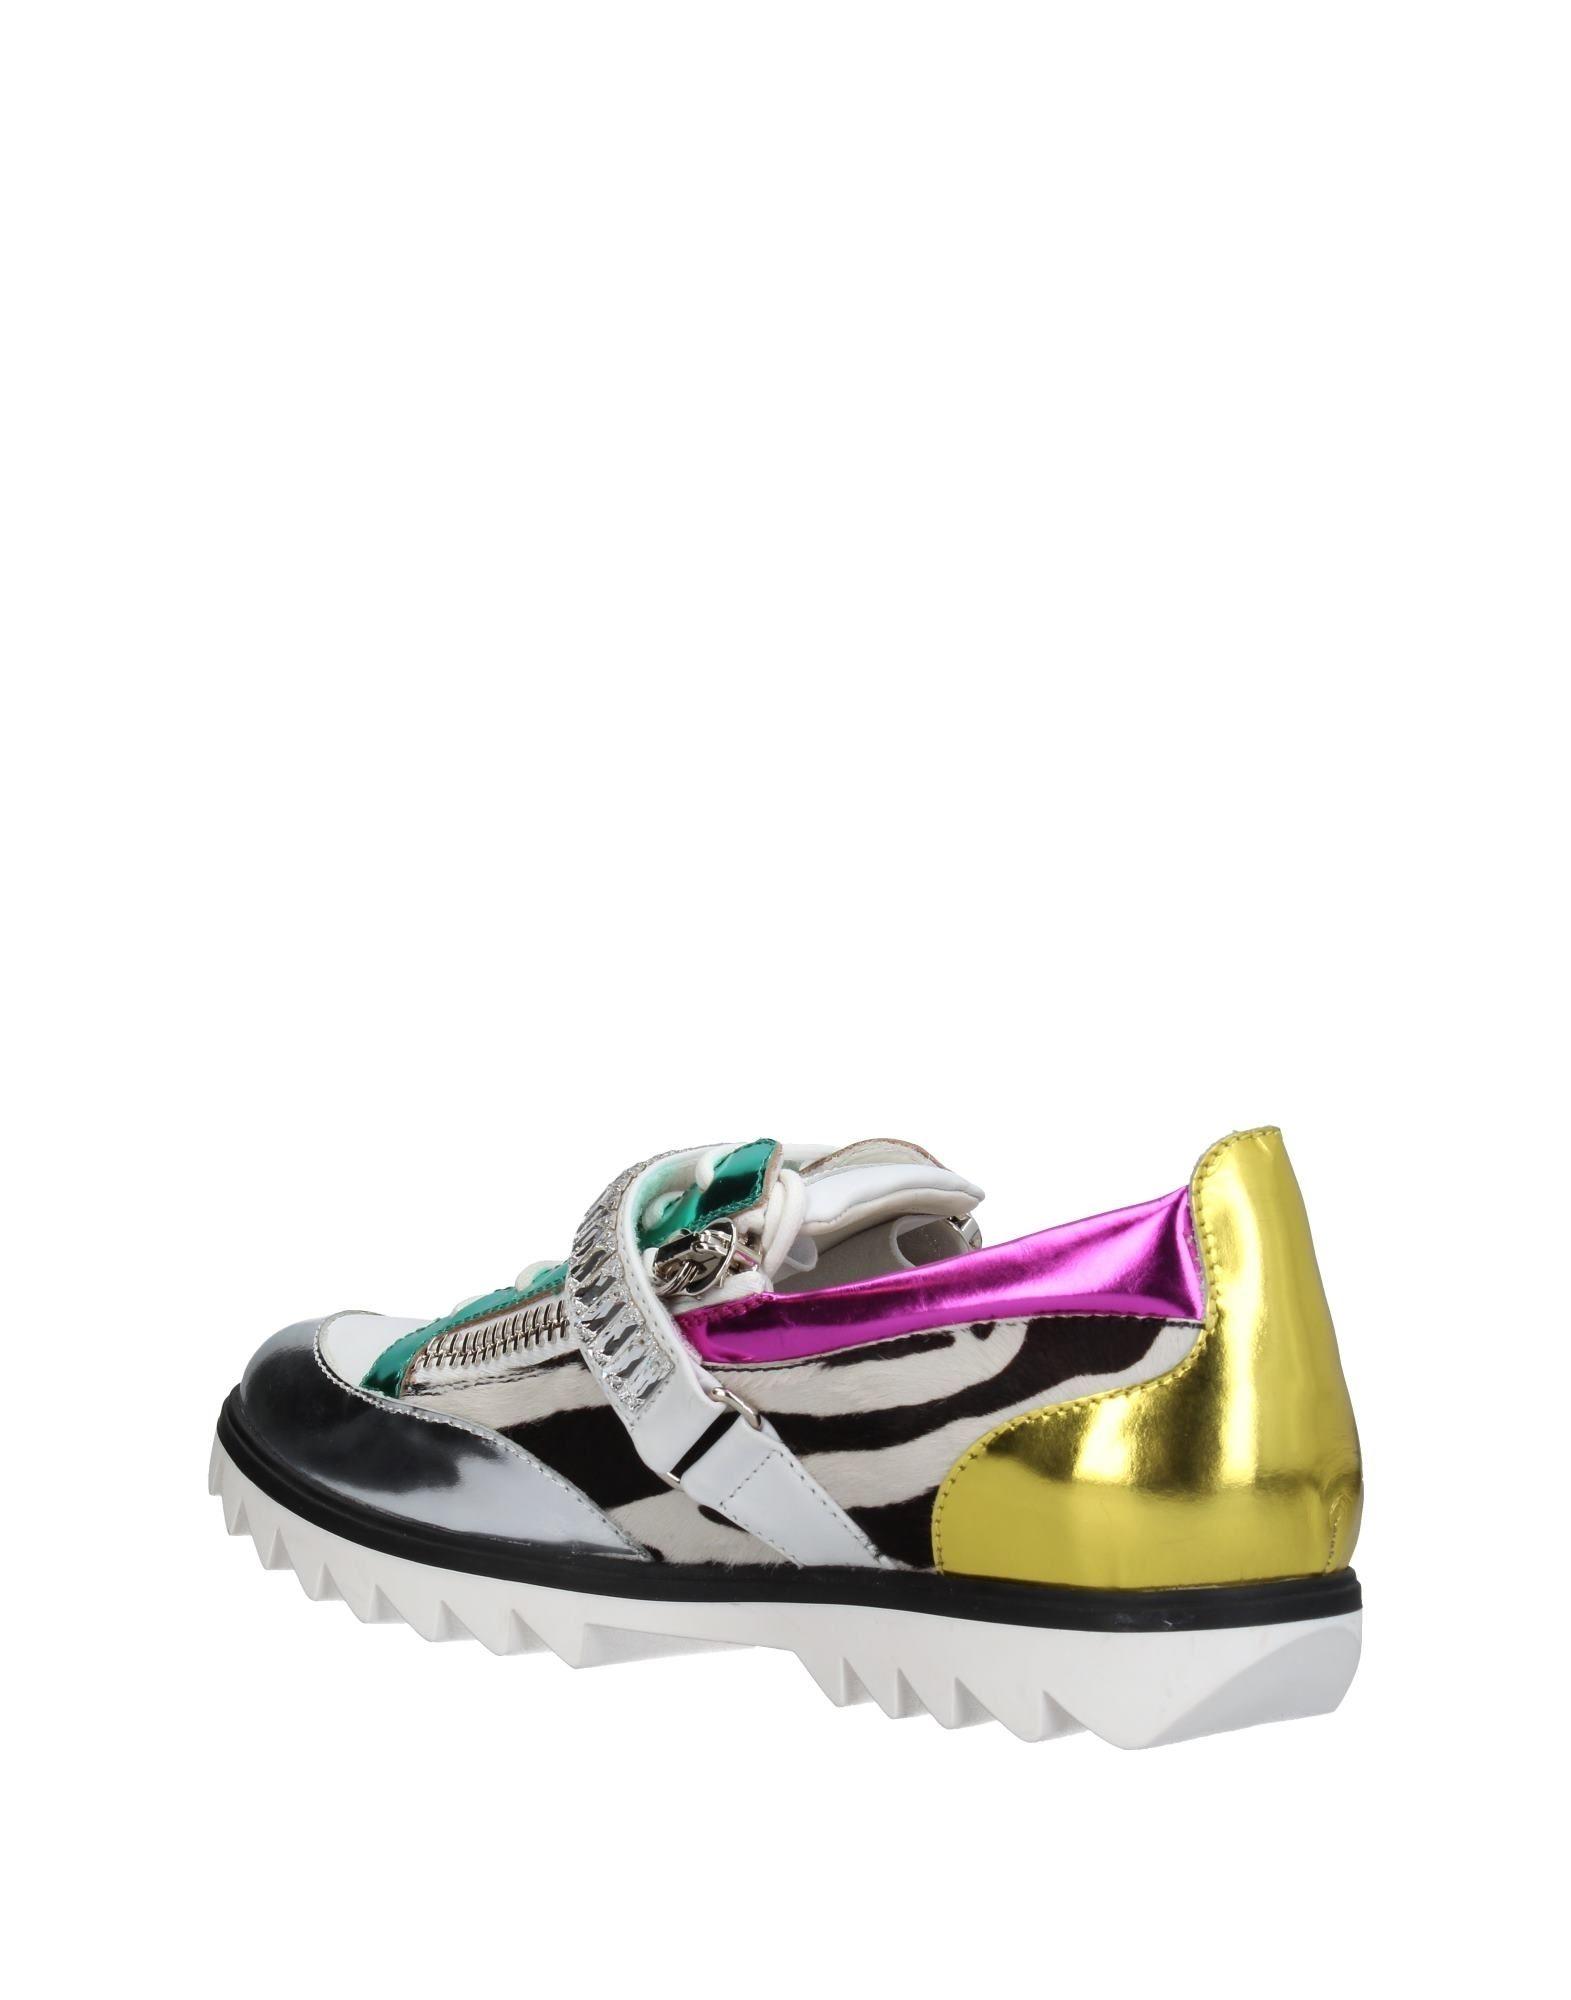 Giuseppe Giuseppe Giuseppe Zanotti Sneakers Herren  11378720LC 564a93